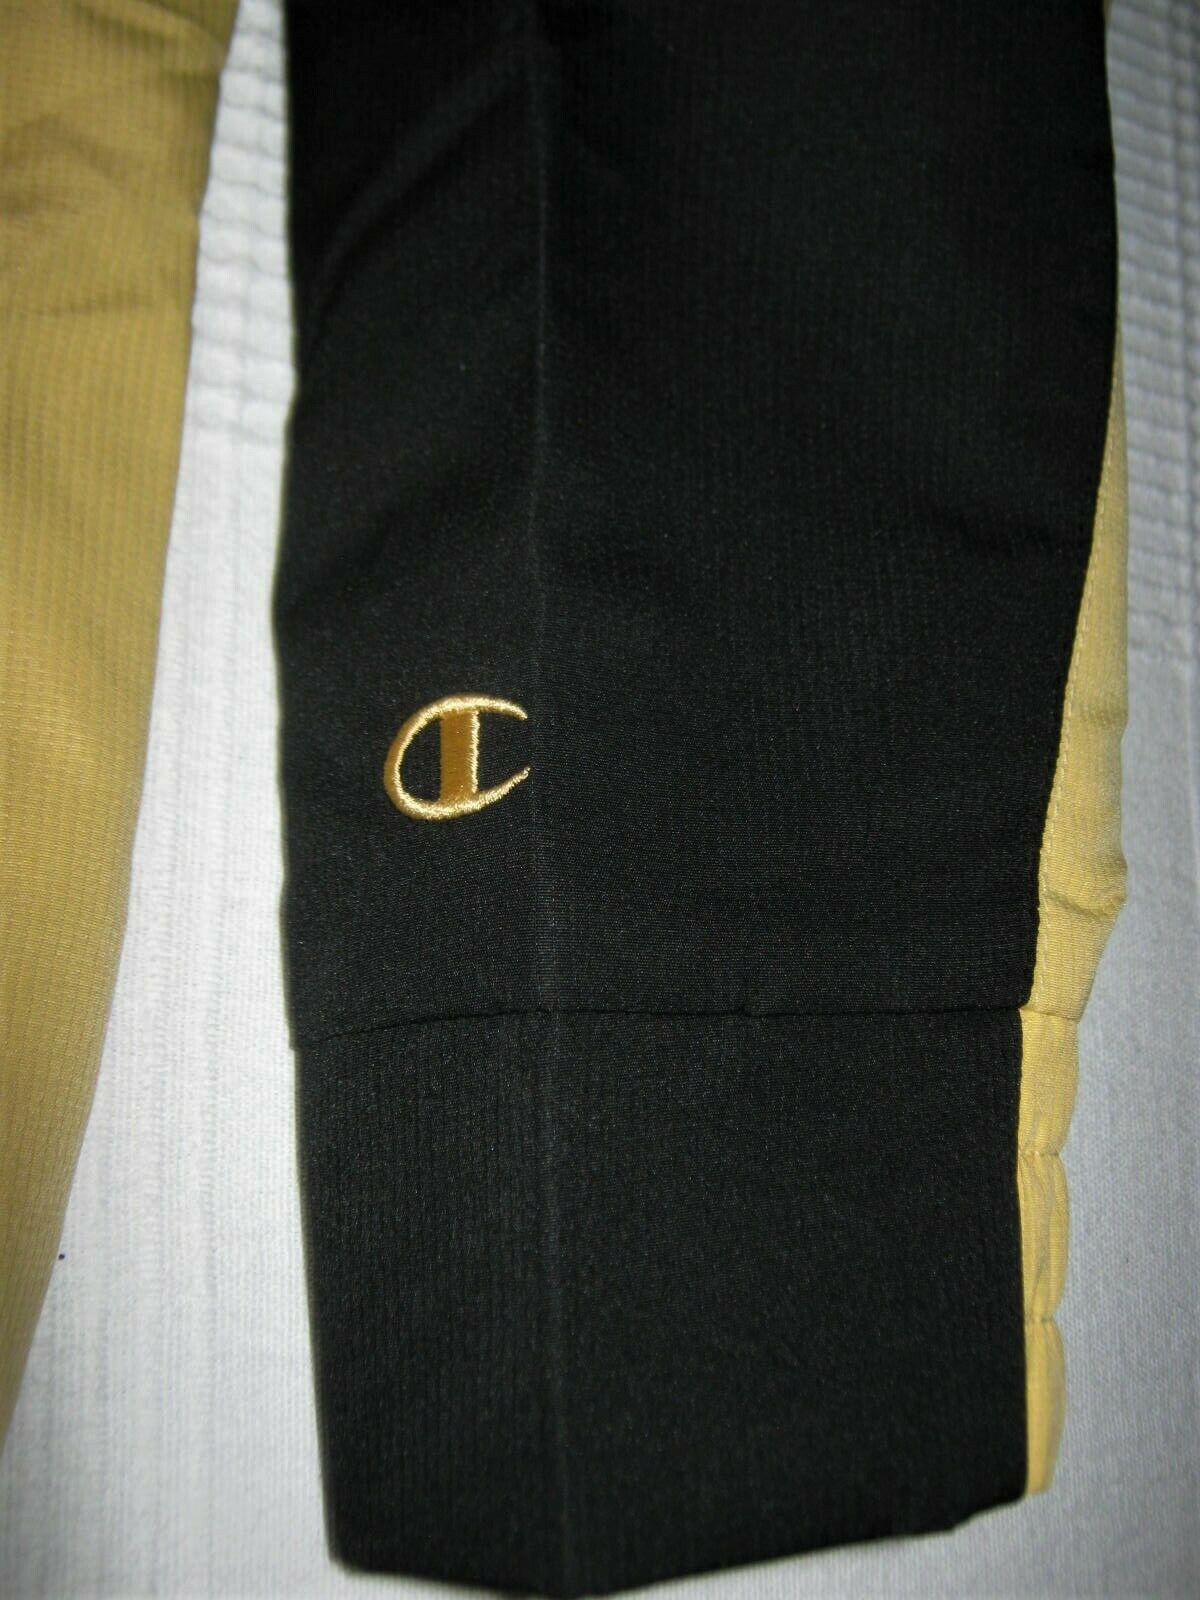 Purdue Boilermakers Jacket Quarter-Zip Pullover Champion Windjacket Black/Gold L